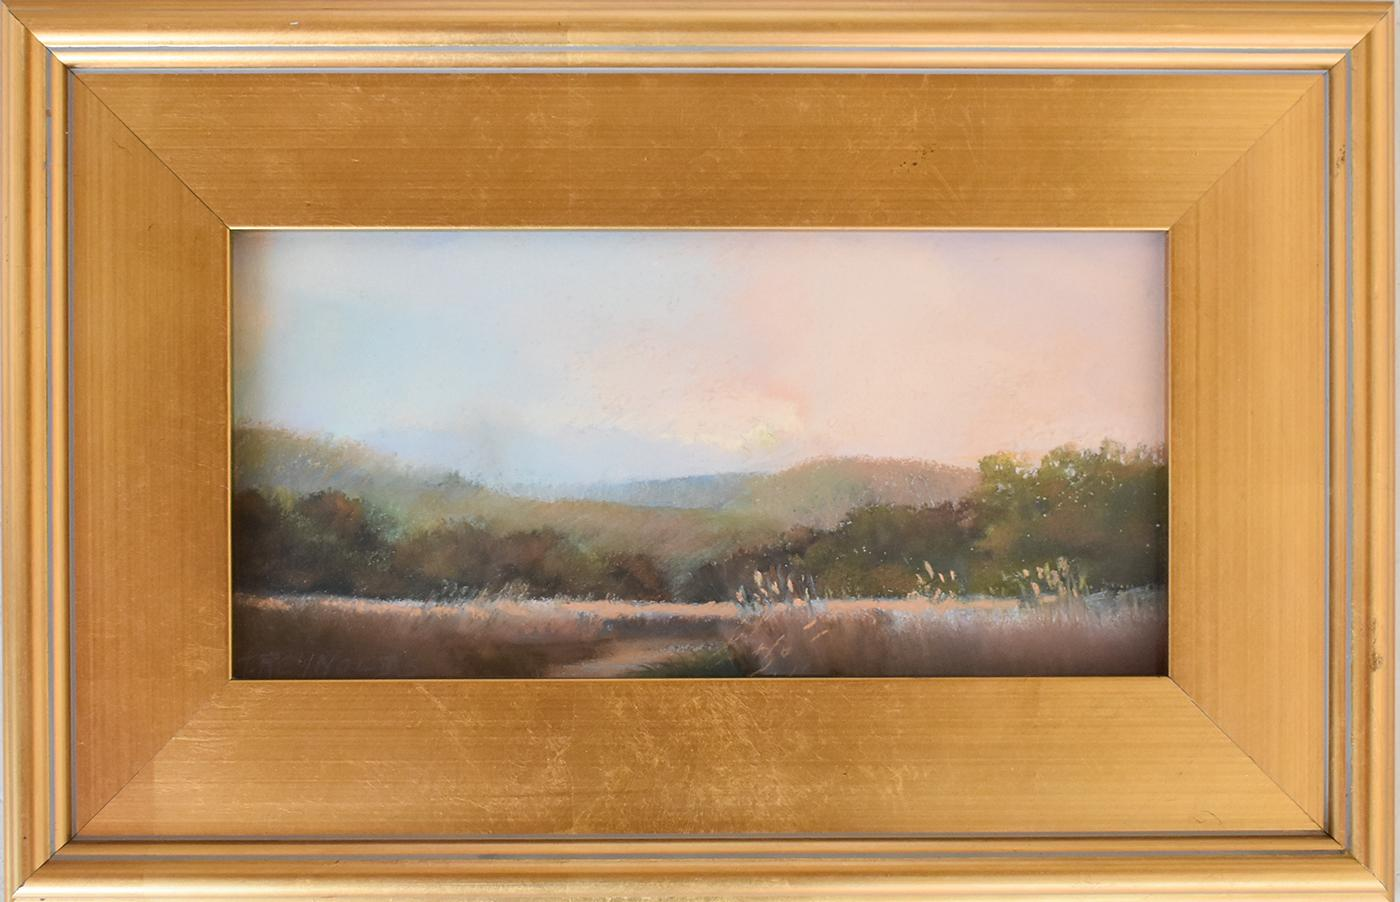 Iona Marsh (En Plein Air Landscape Pastel Drawing on Paper in a Gold Frame)